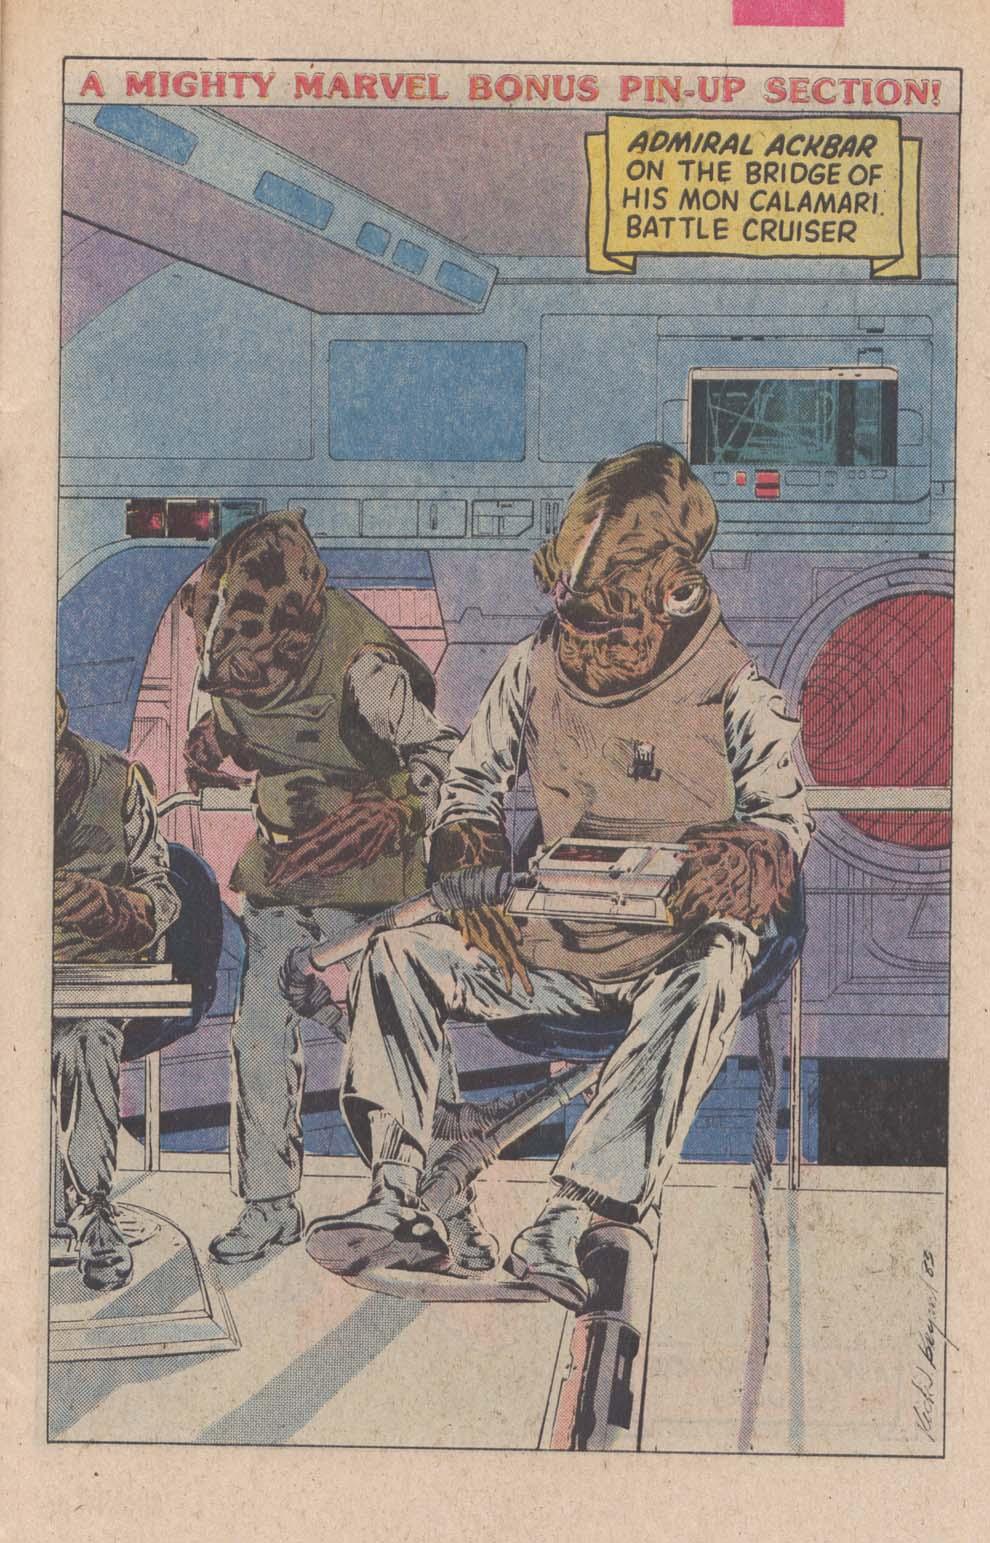 Read online Star Wars: Return of the Jedi comic -  Issue #4 - 21